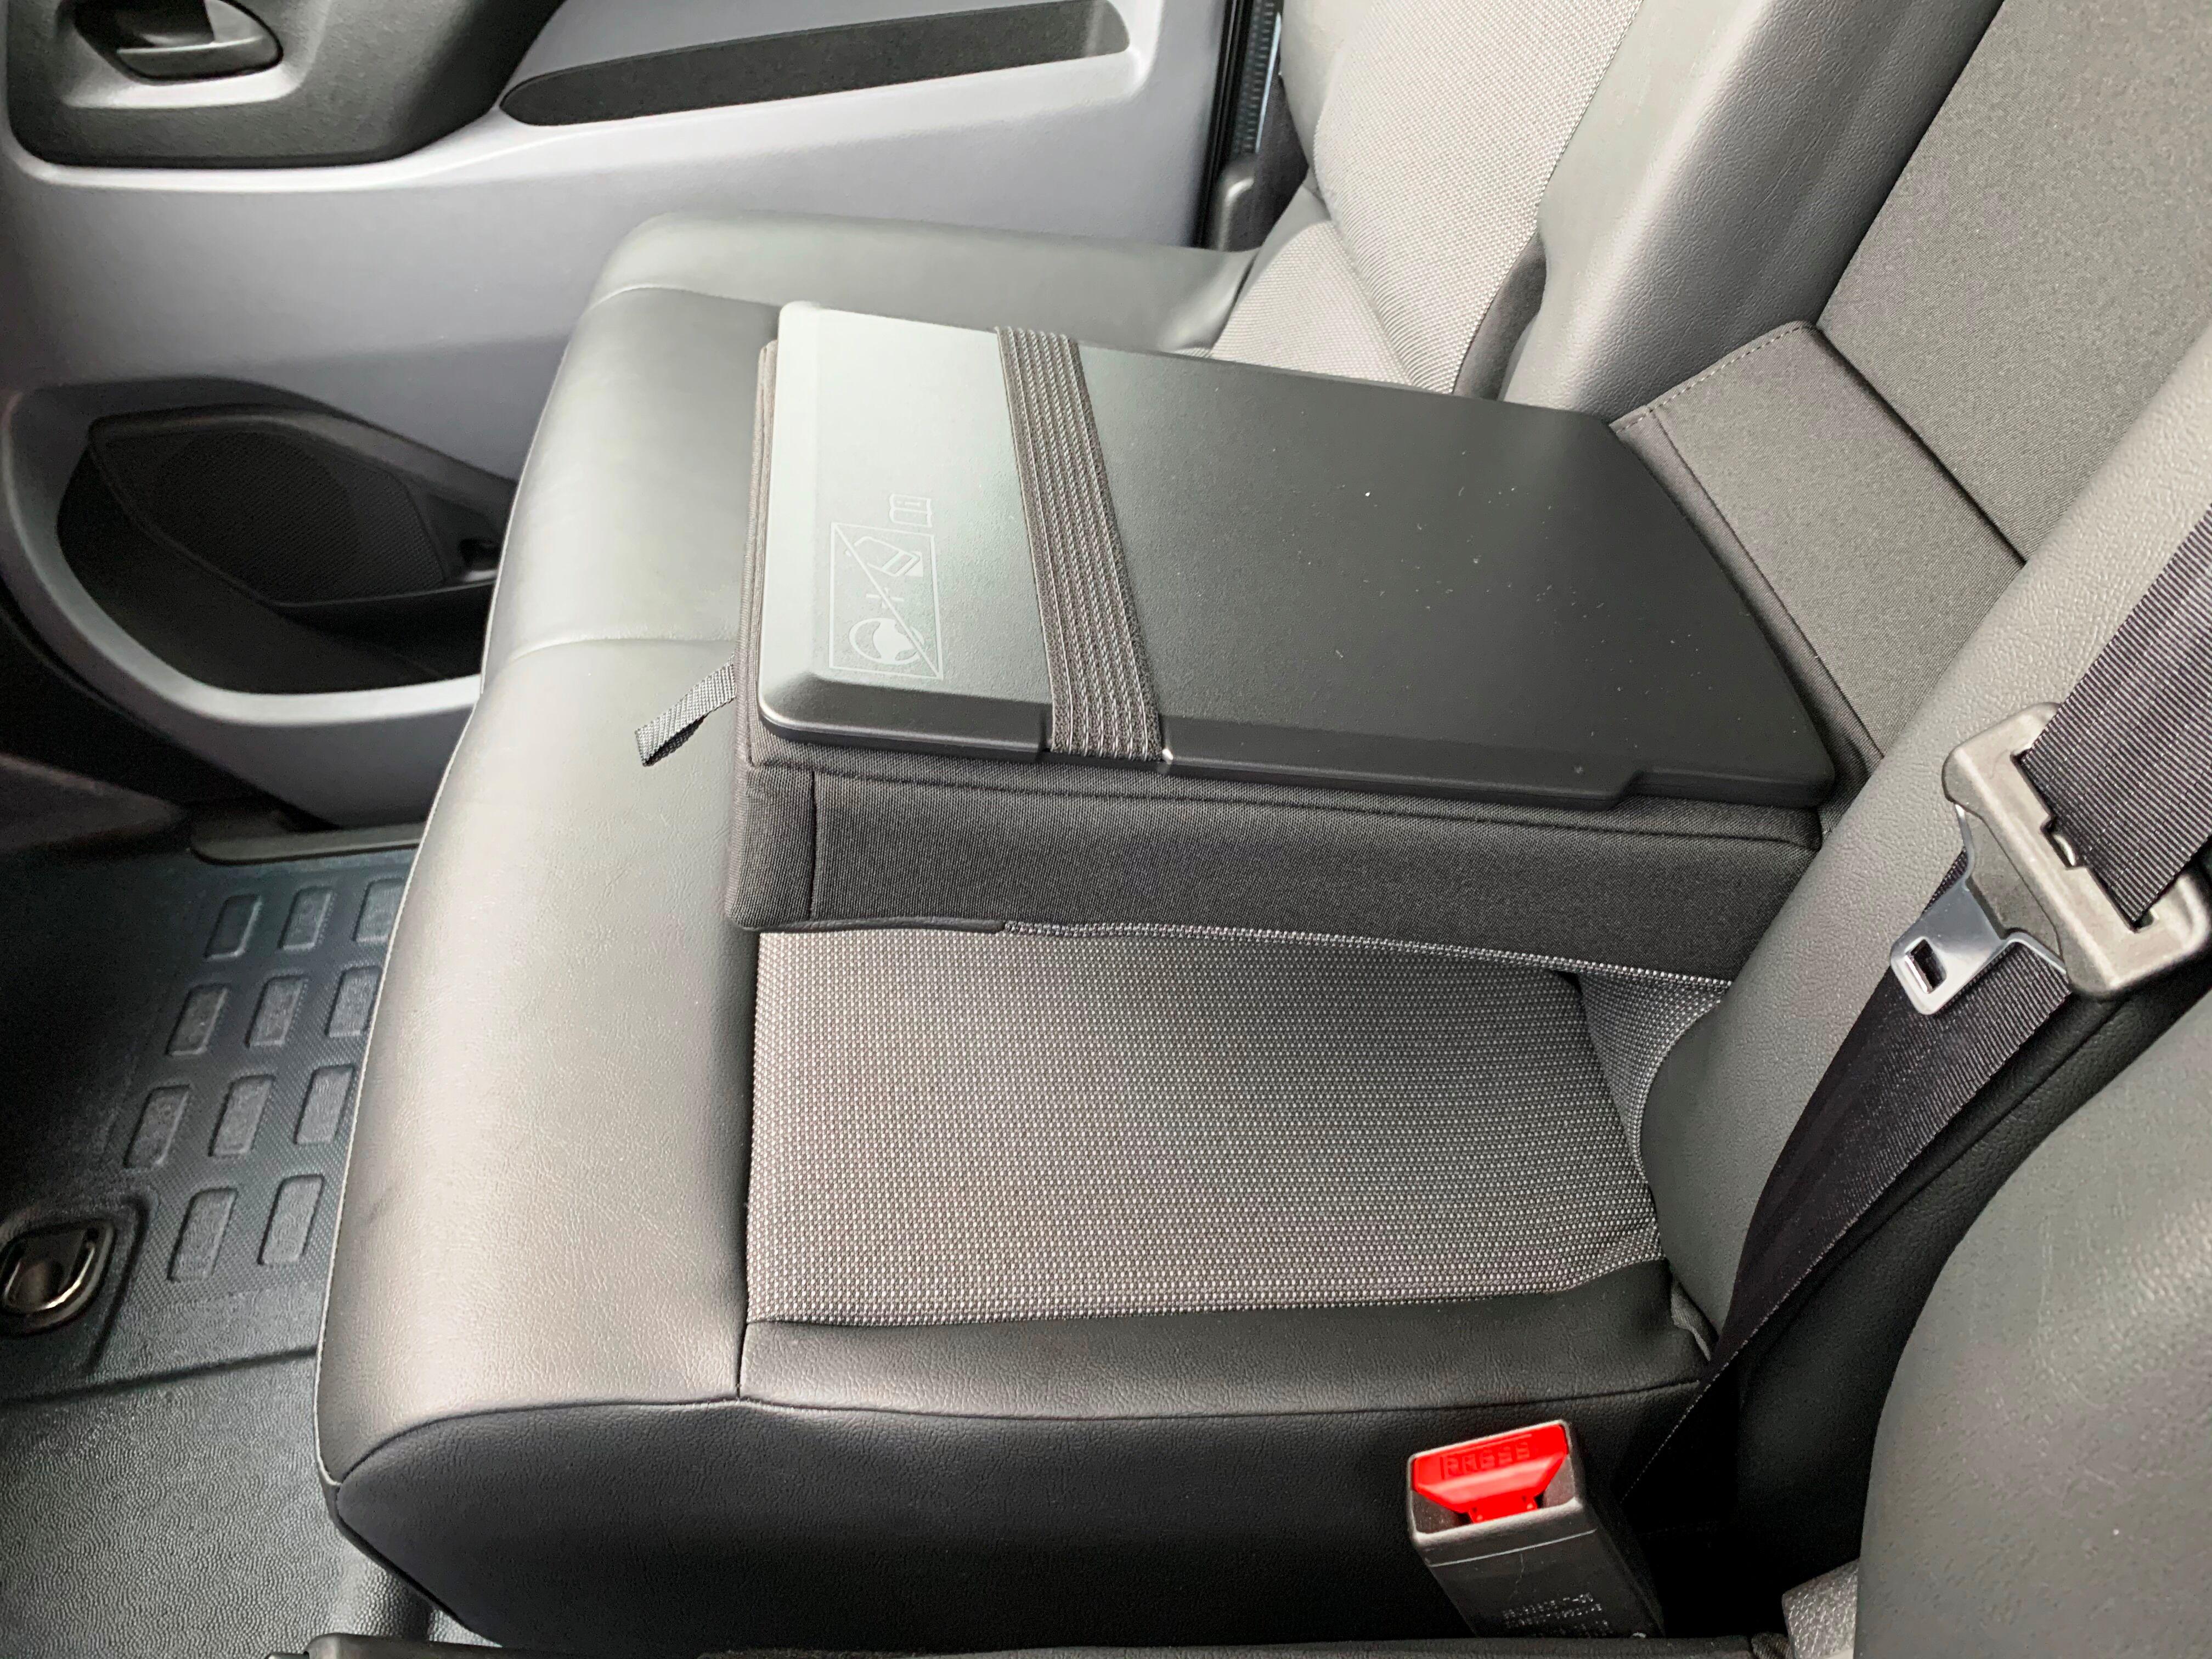 Opel Vivaro 2.0D 122PK Edition L3H1 NIEUW in stock 35% korting 23/29